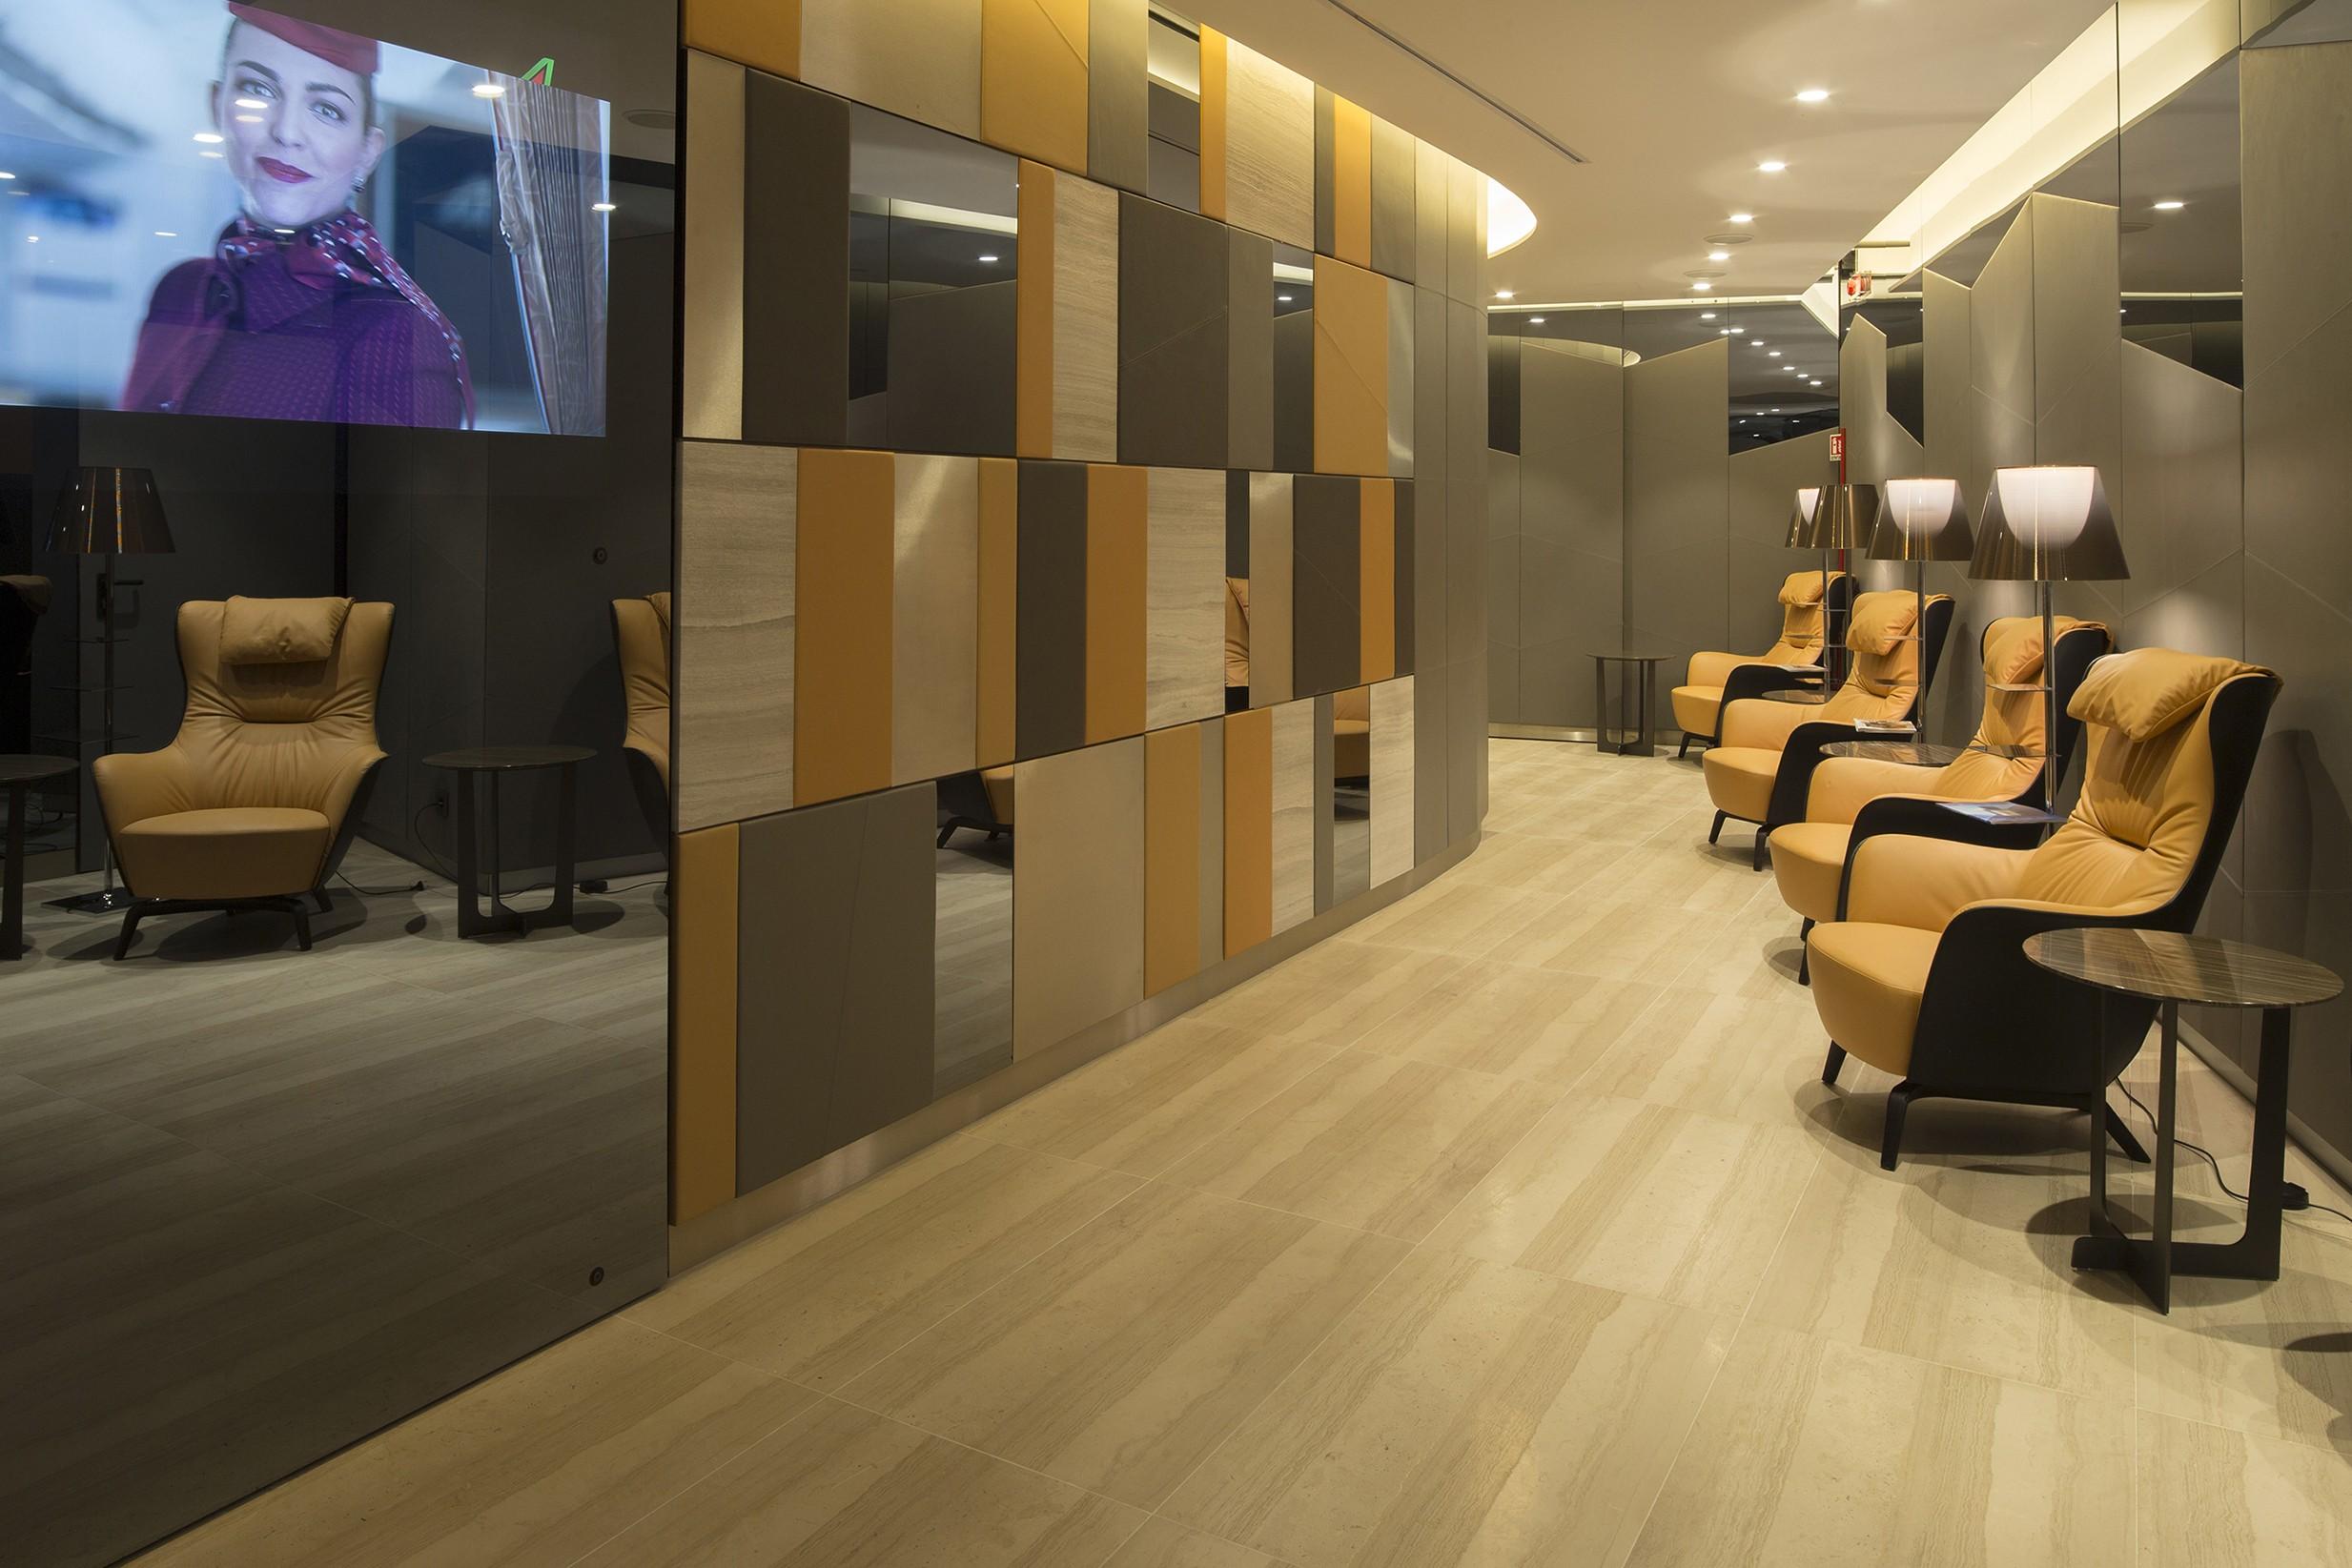 New Casa Alitalia flagship lounges | Poltrona Frau Group Contract ...